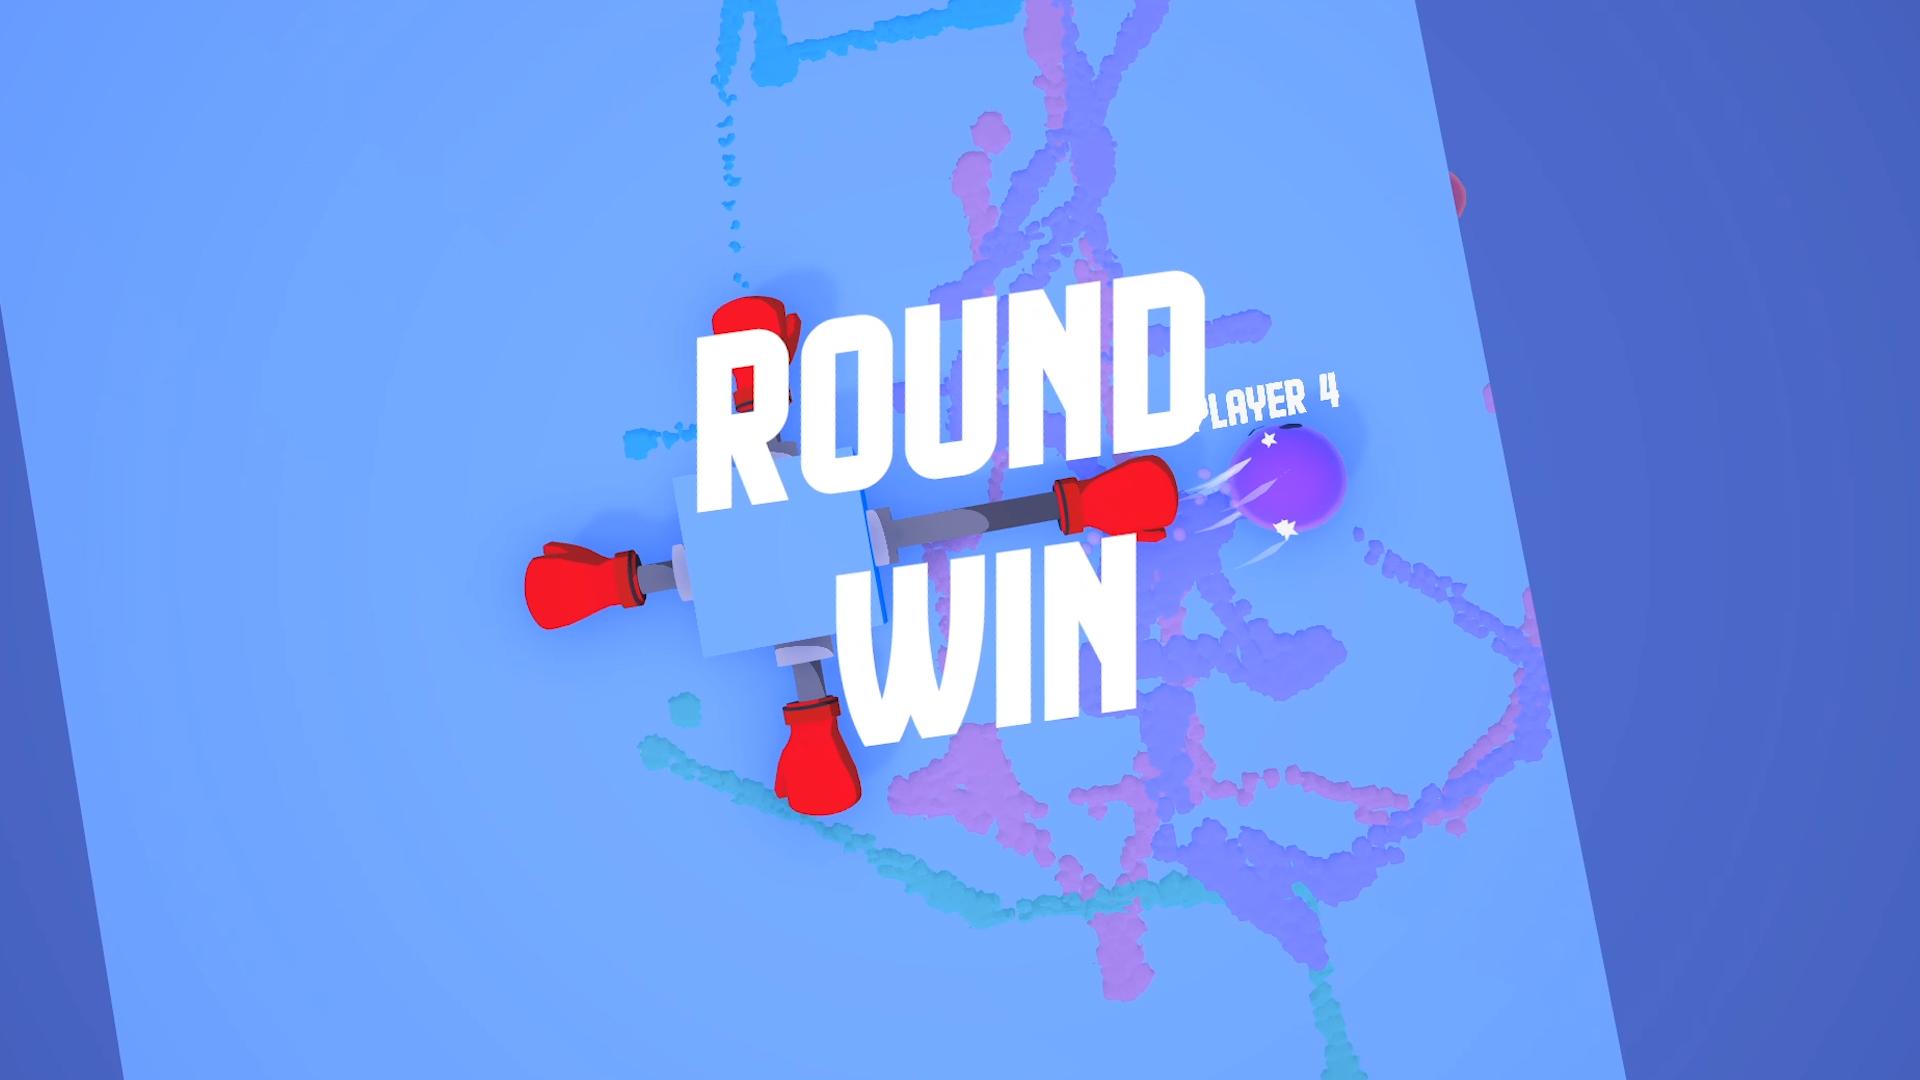 RoundWin